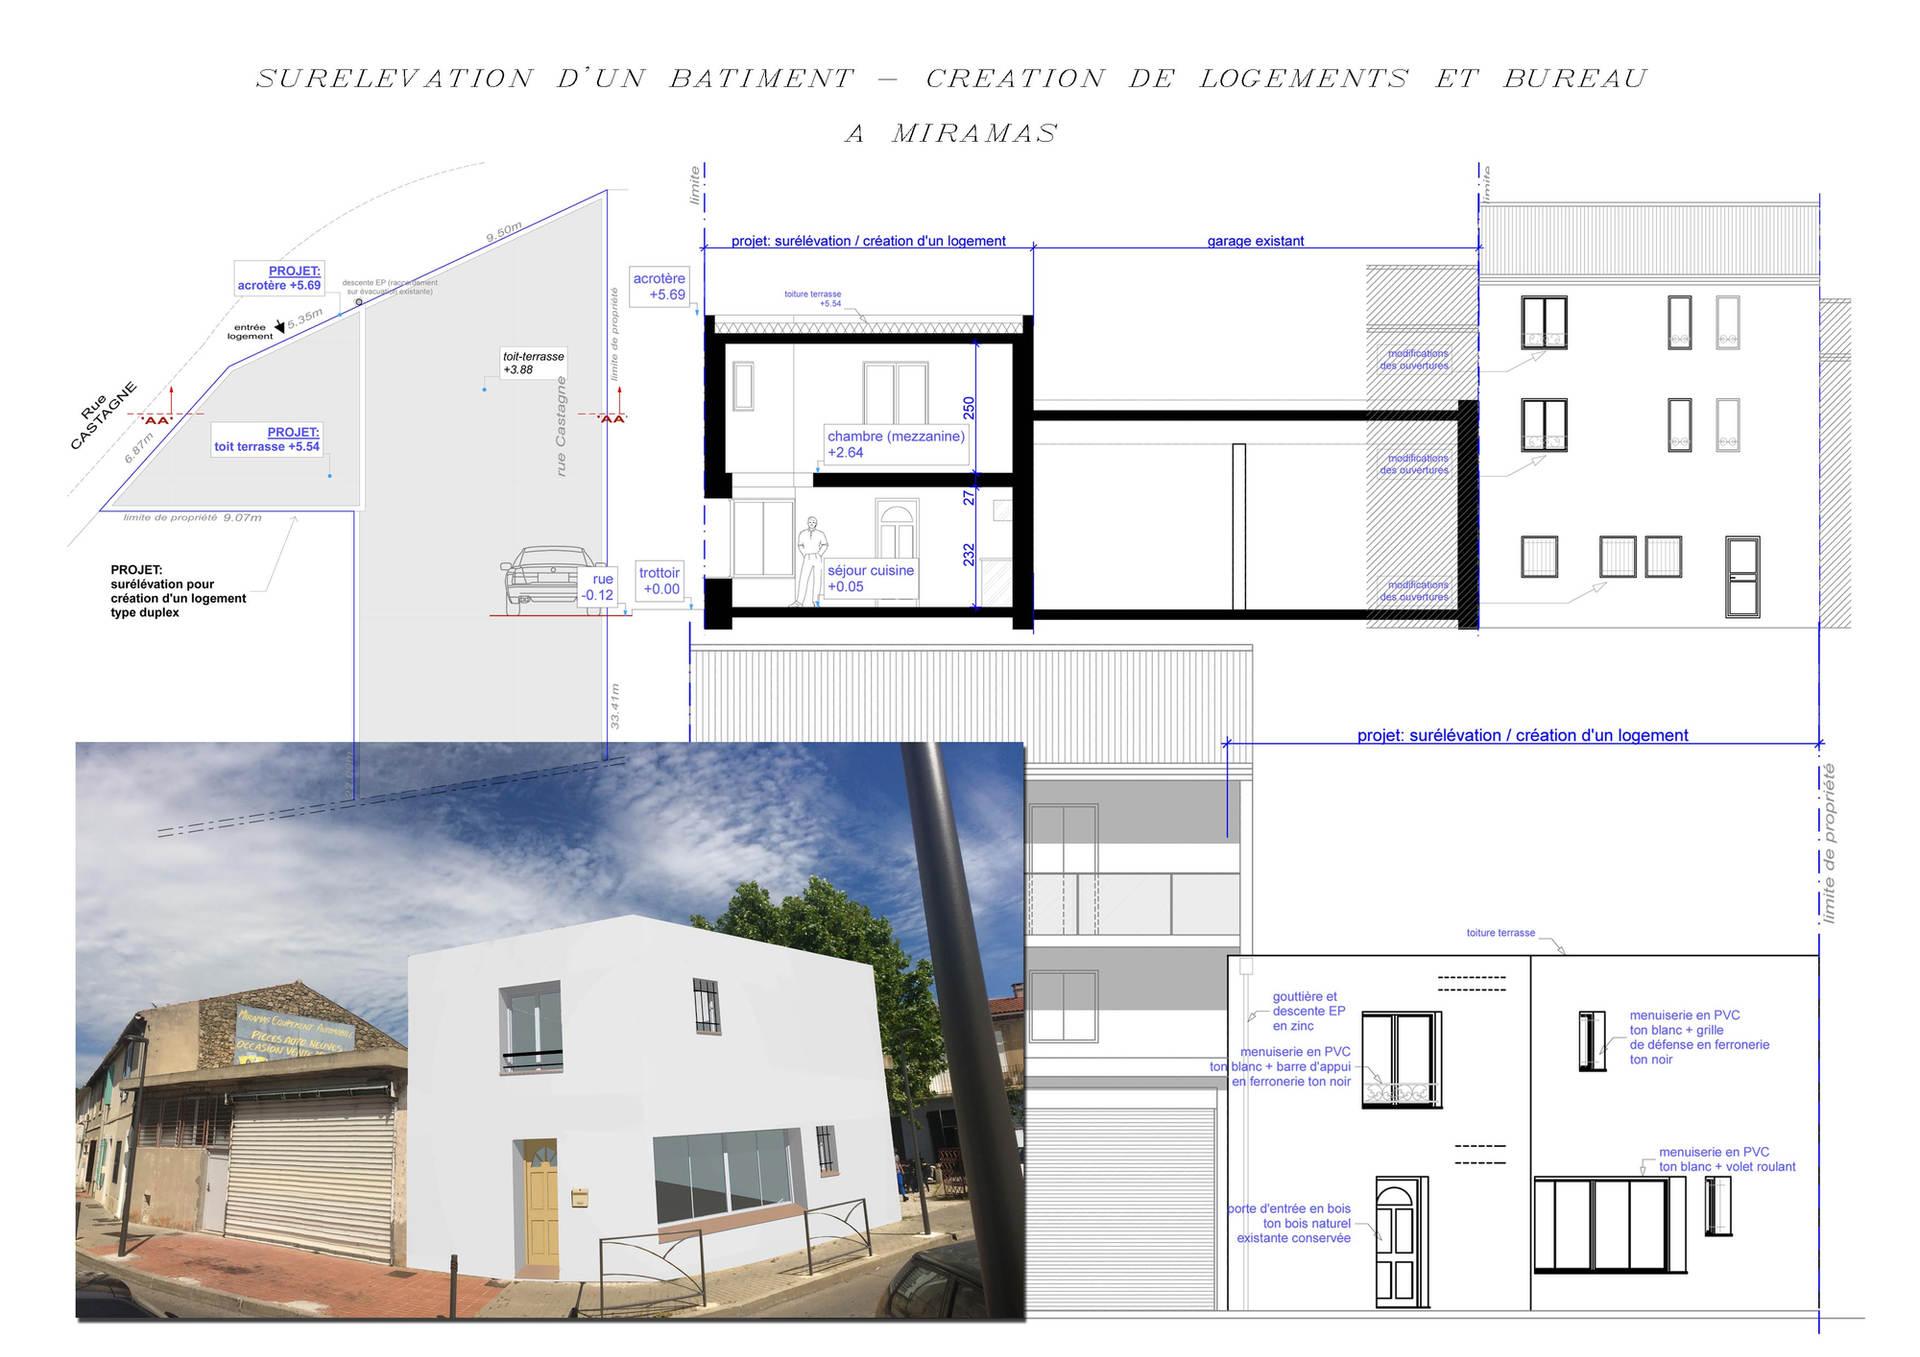 098-logement-miramas.jpg